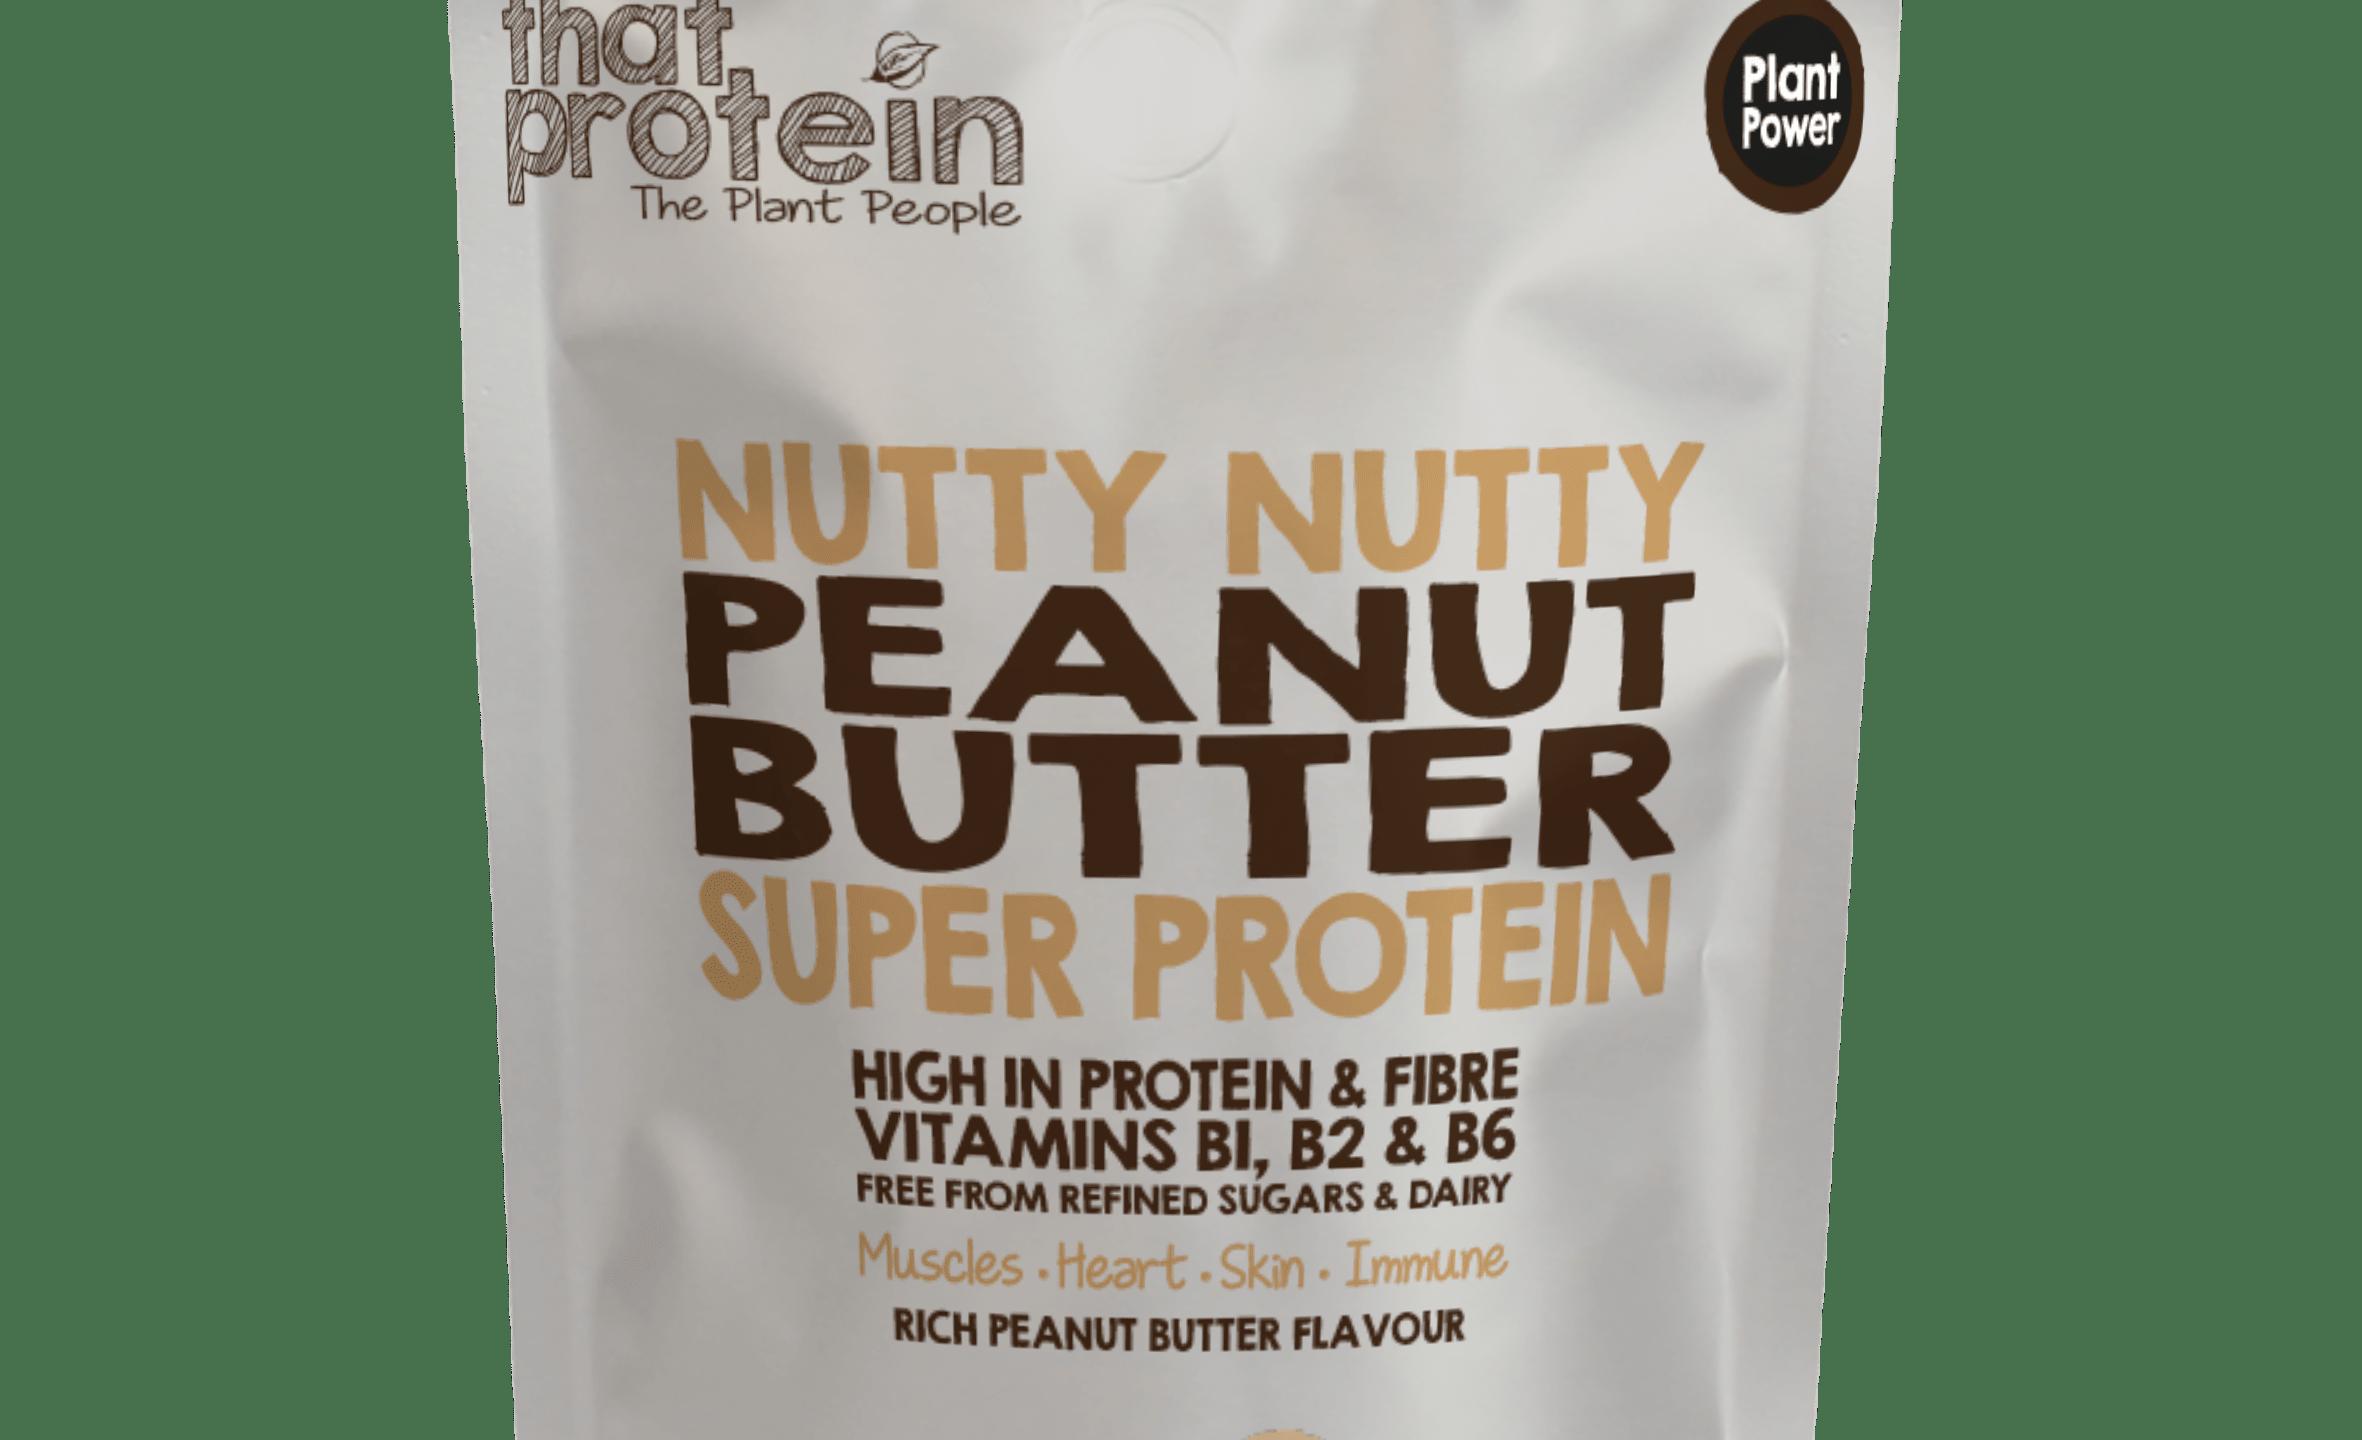 Peanut Butter Super Protein